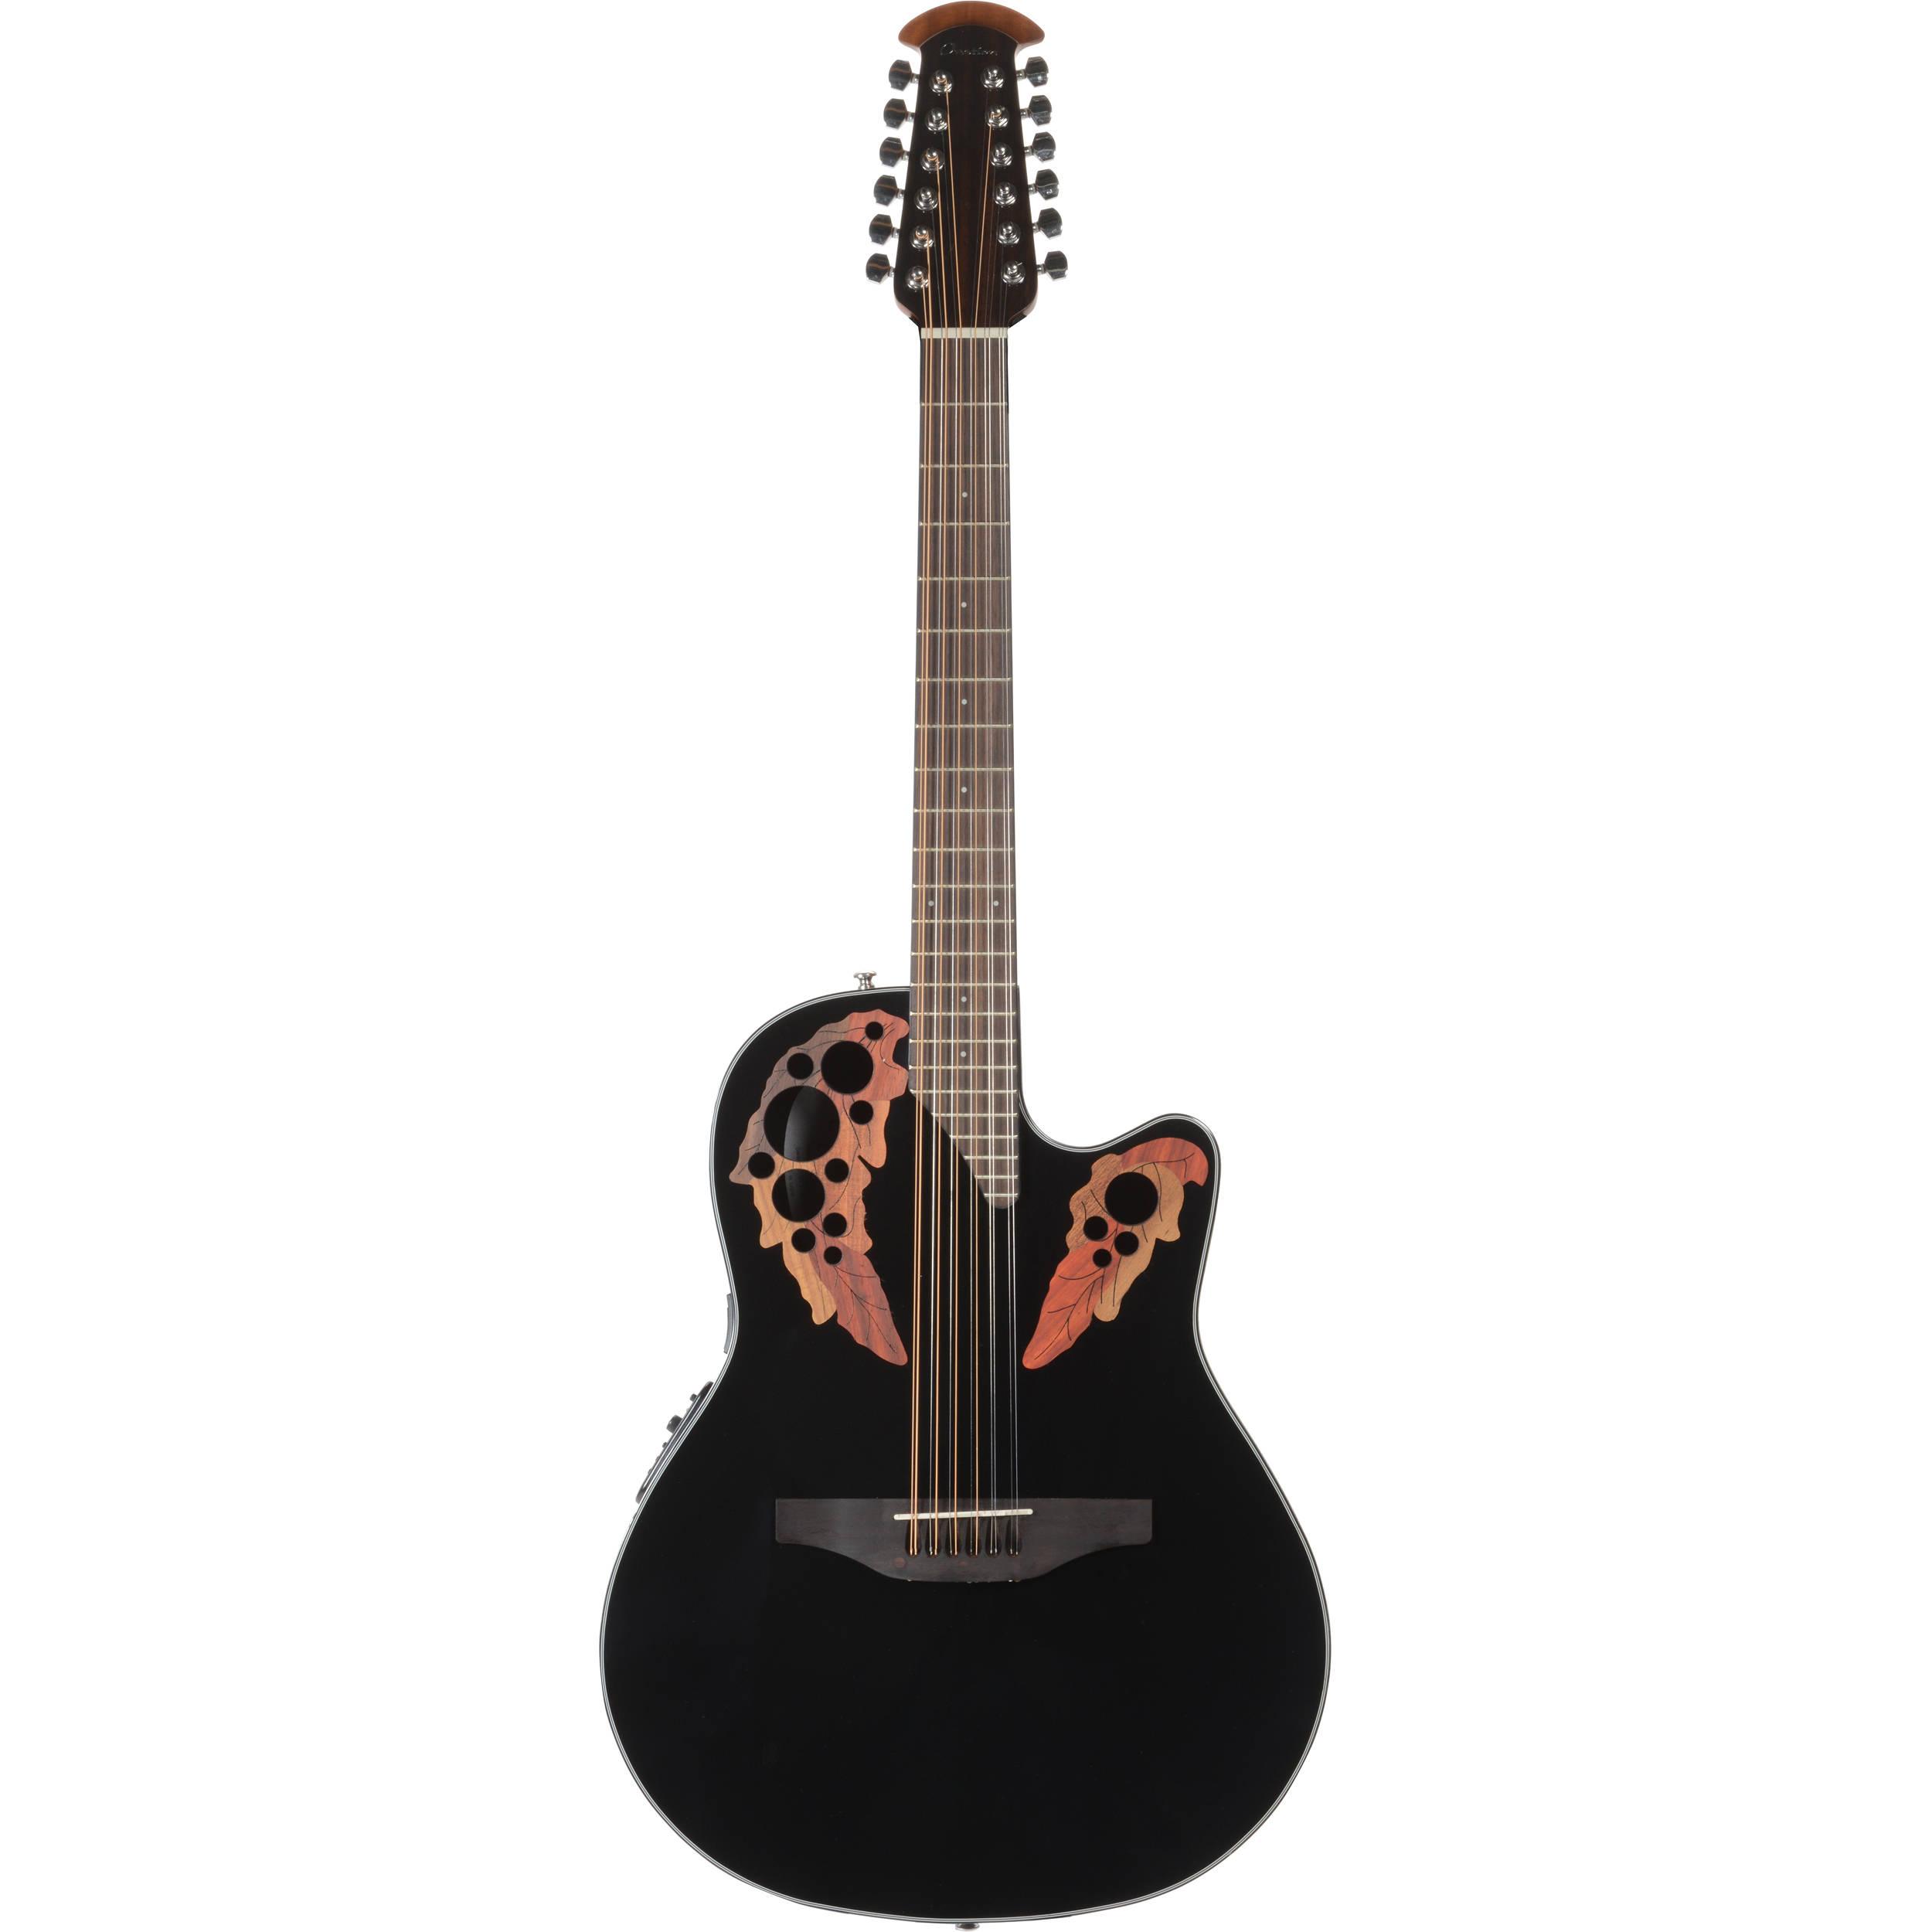 Amazon.com: ovation 12 string guitar